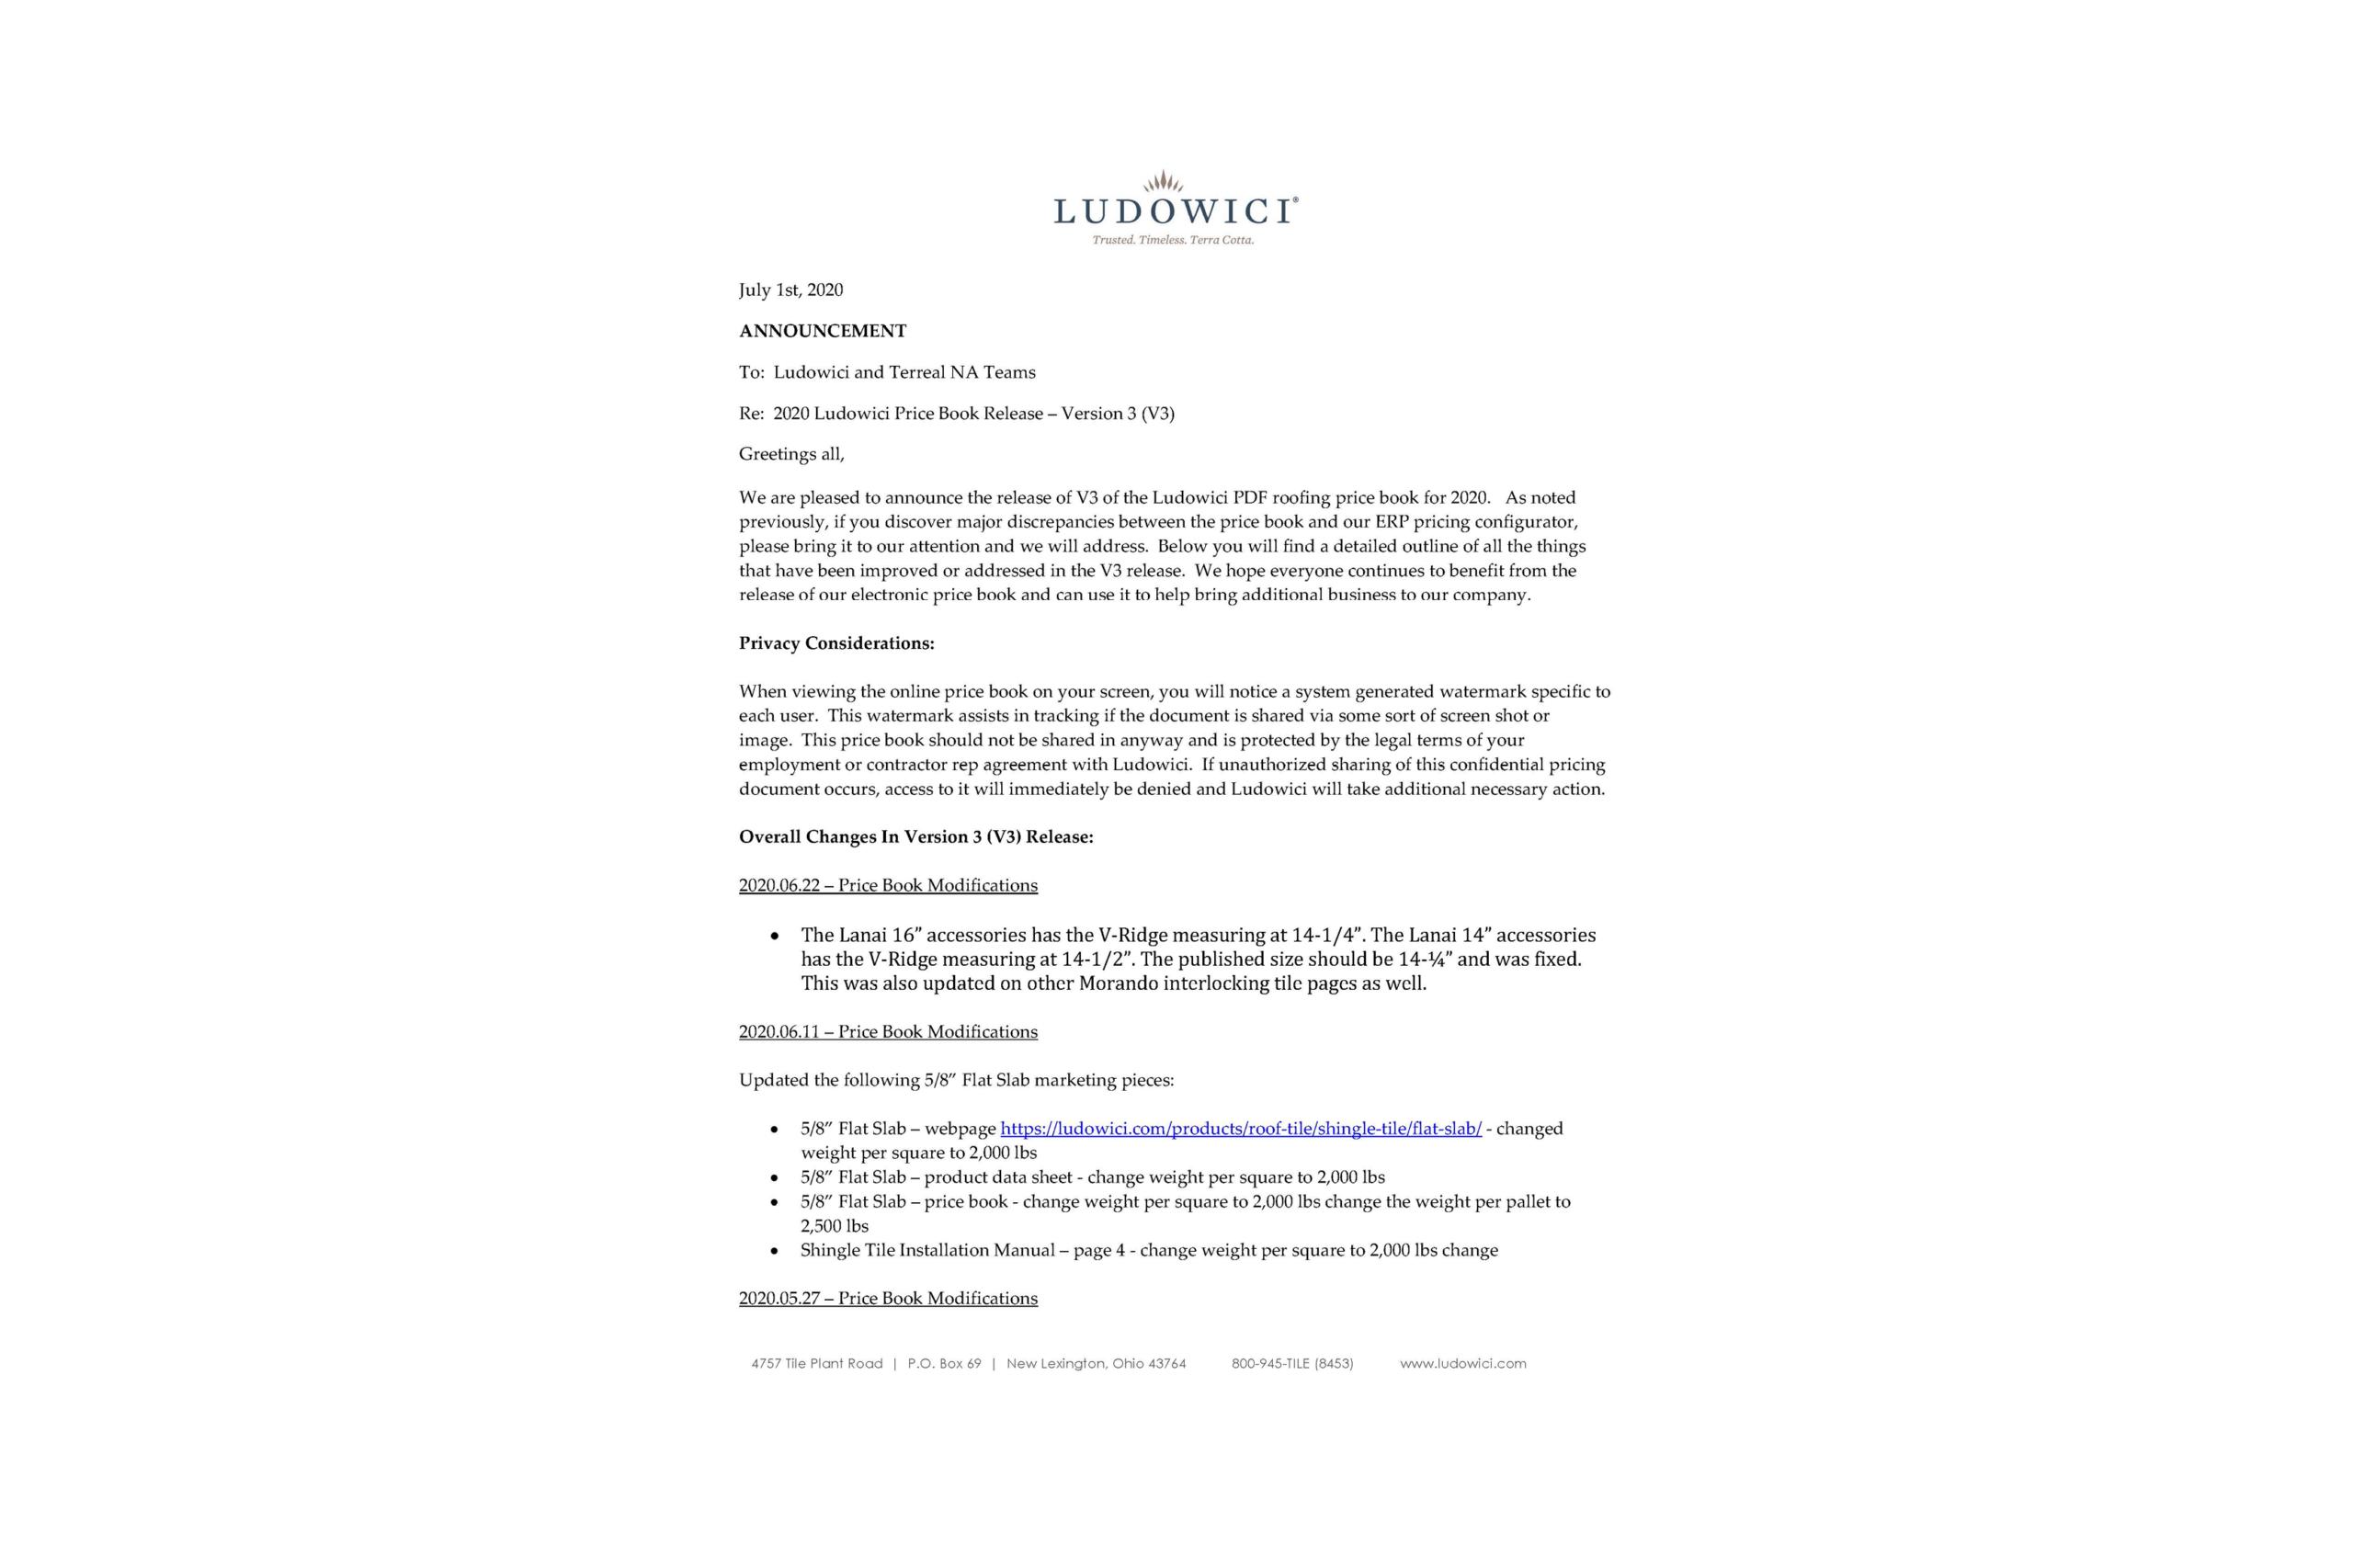 2020 Ludowici Price Book – V3 Release Info